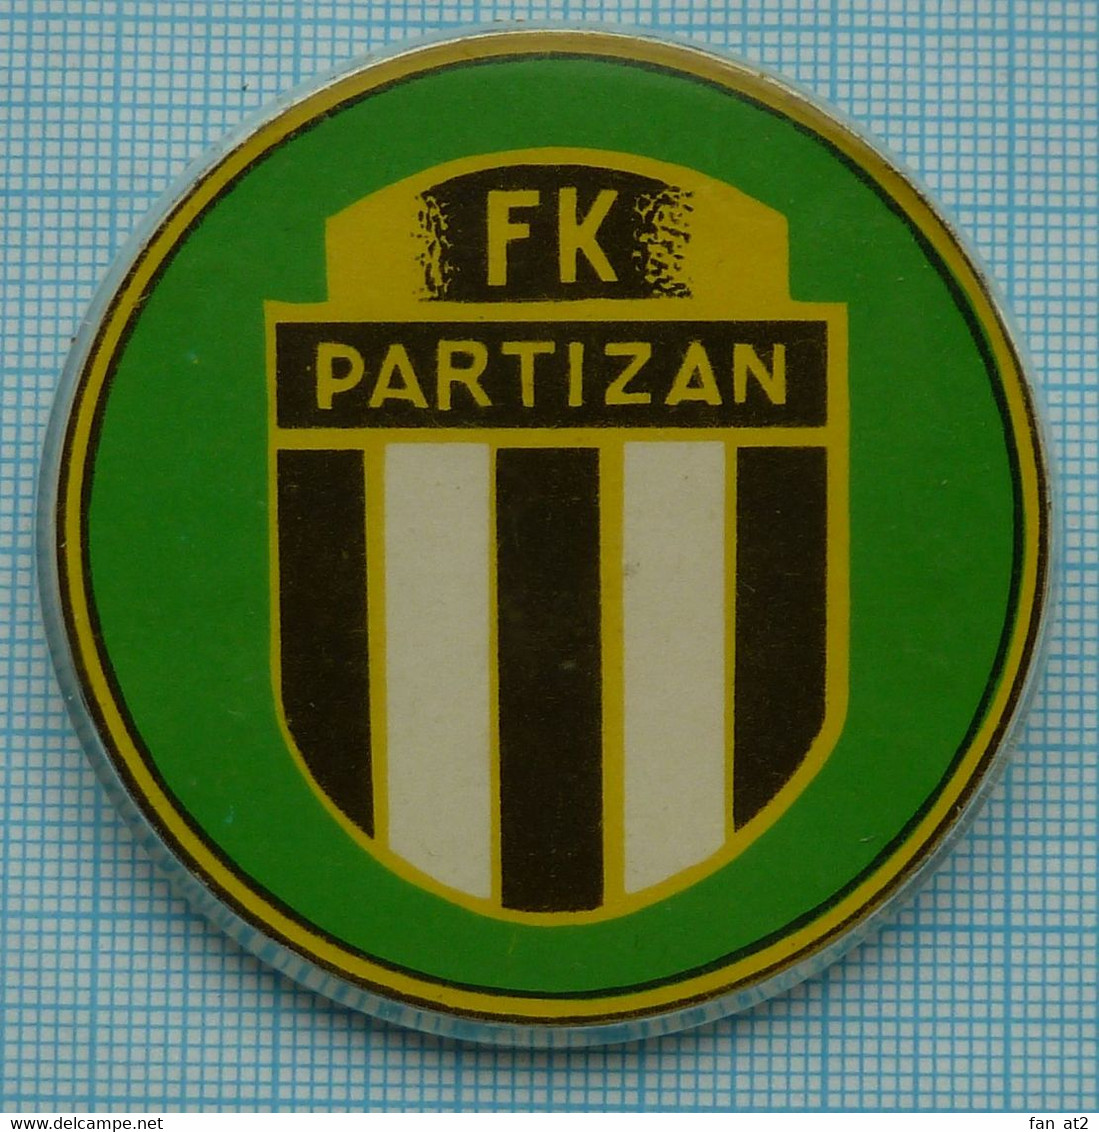 USSR / Badge / Soviet Union / Football FK PARTIZAN. Belgrade. Yugoslavia. 1970-80s - Calcio